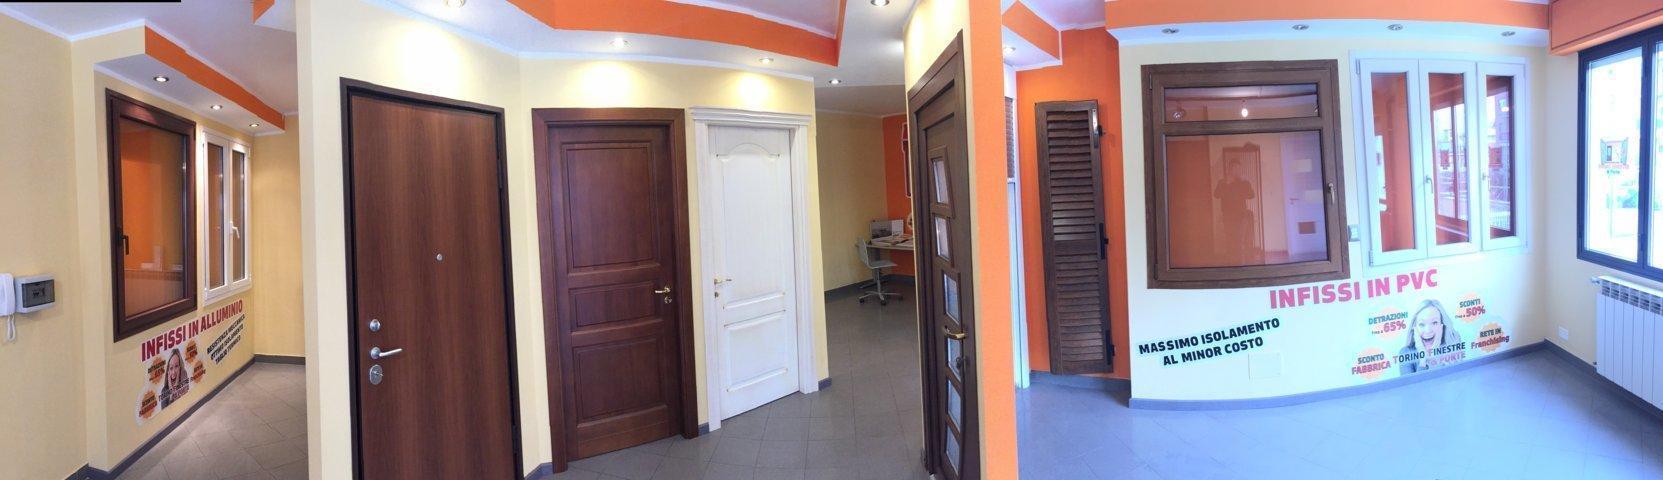 Offerte prezzi fabbrica online serramenti infissi finestre for Serramenti in pvc brescia prezzi